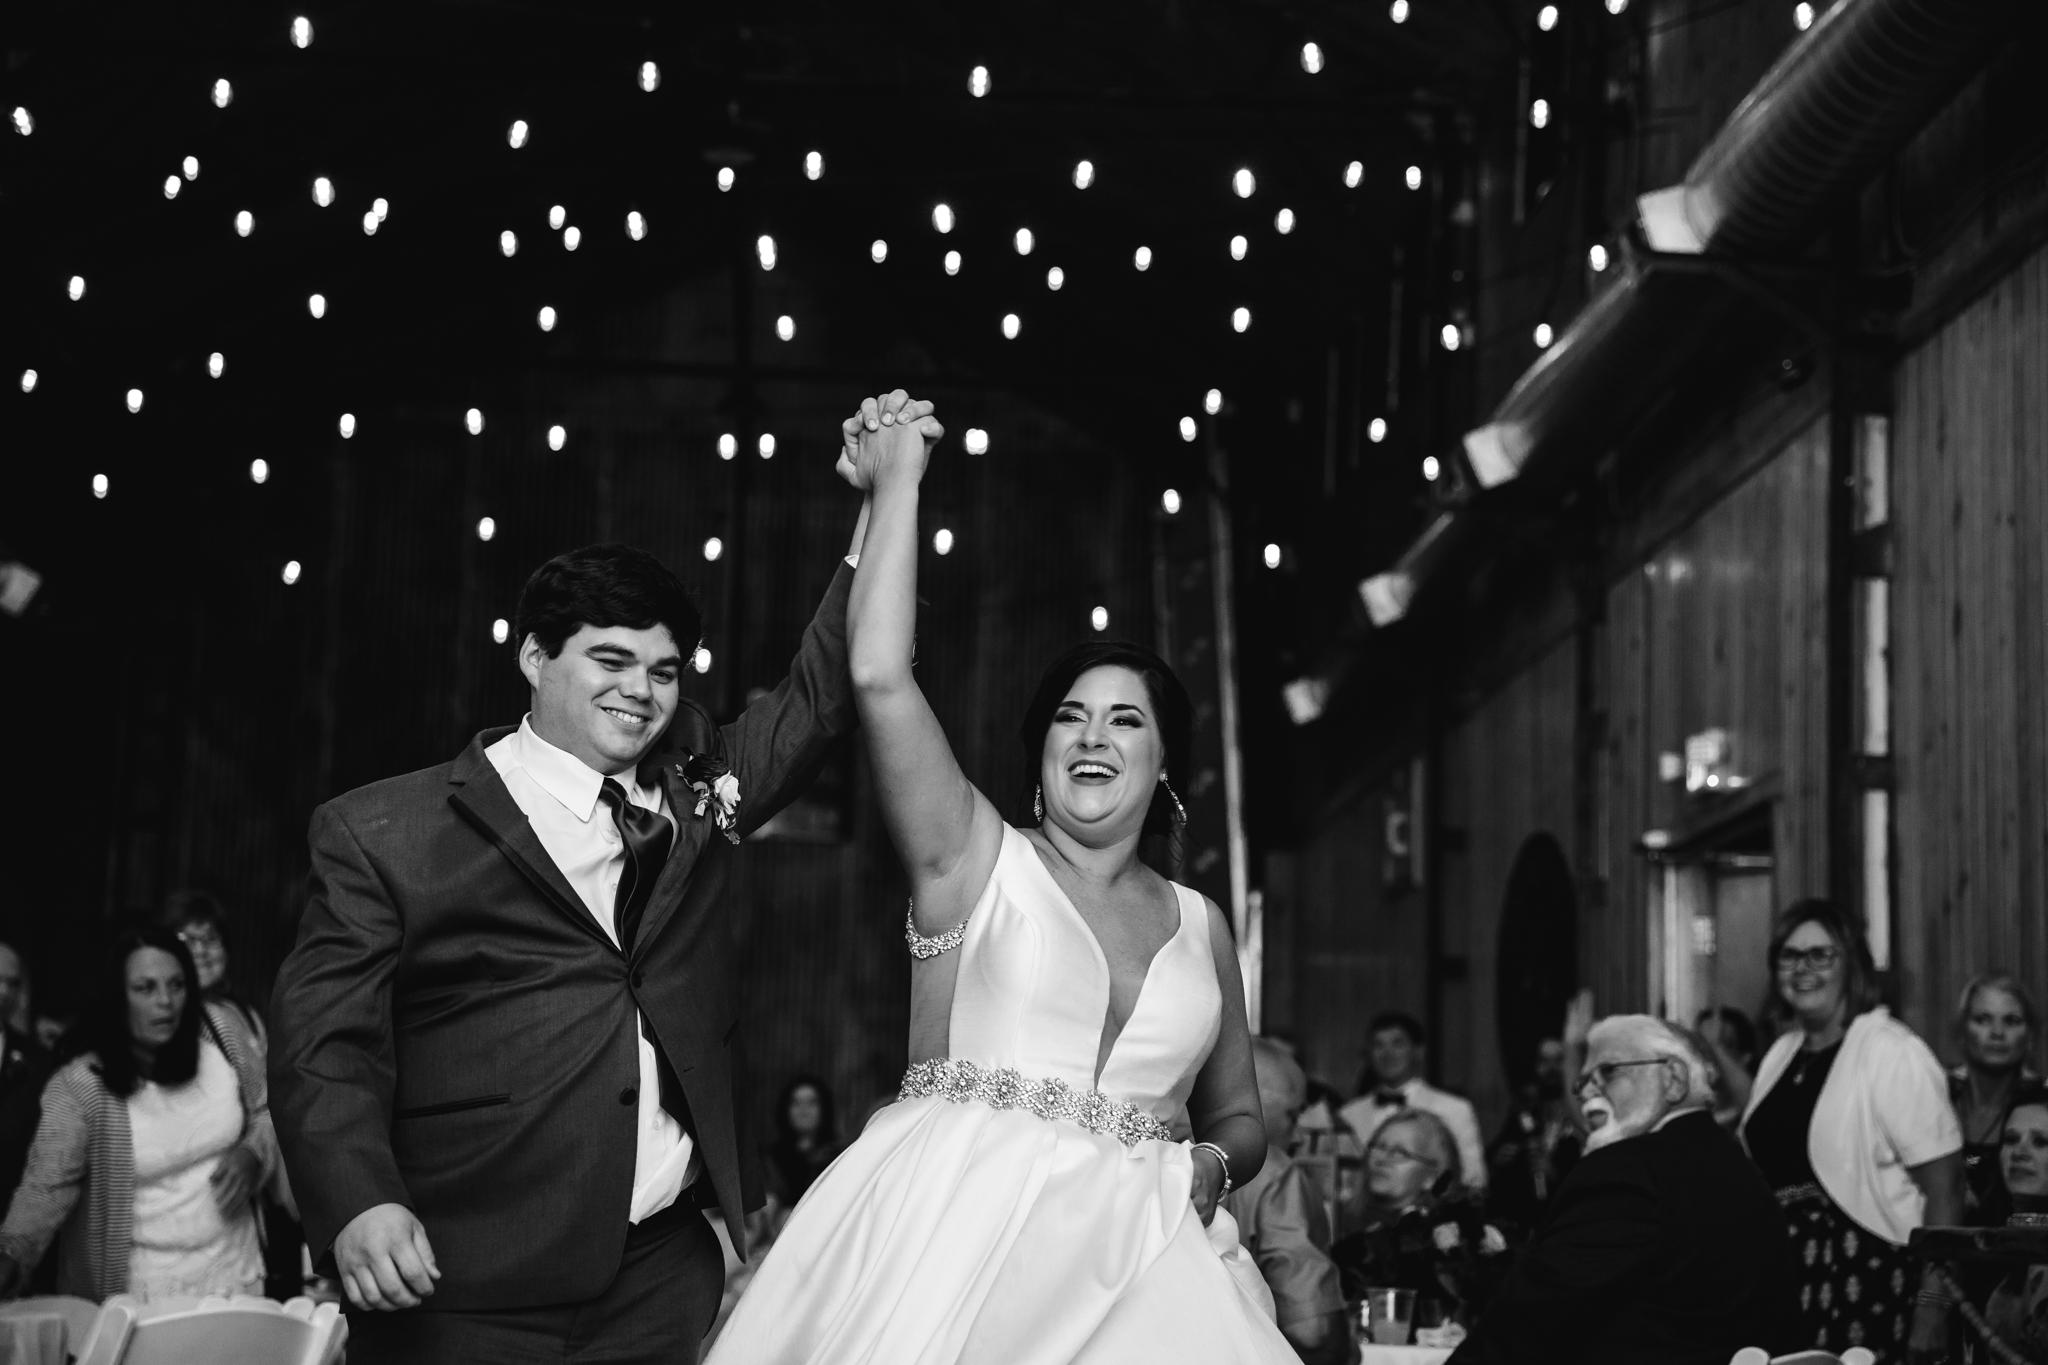 arkansas-wedding-photographer-thewarmtharoundyou-the-delta-gin-wedding-venue-lindsey-mike (29 of 38).jpg